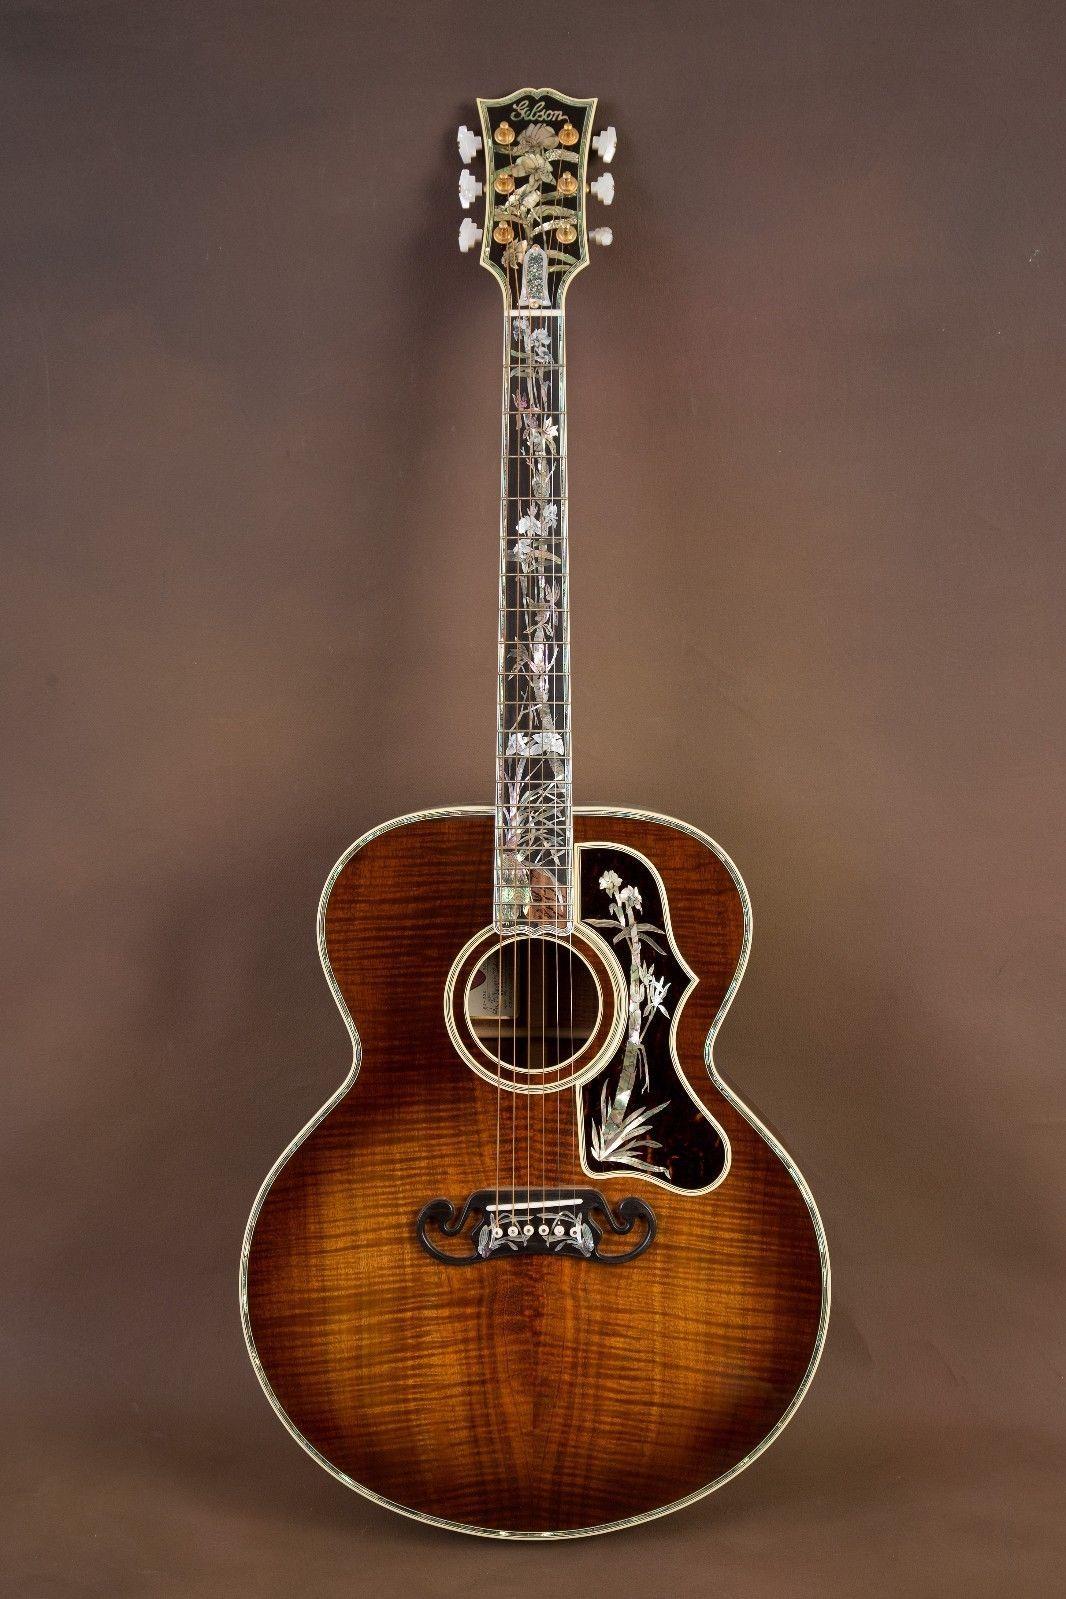 Gibson Sj 200 Koa Master Museum Custom Acoustic Guitar J 200 Bass Guitar Case Custom Acoustic Guitars Gibson Acoustic